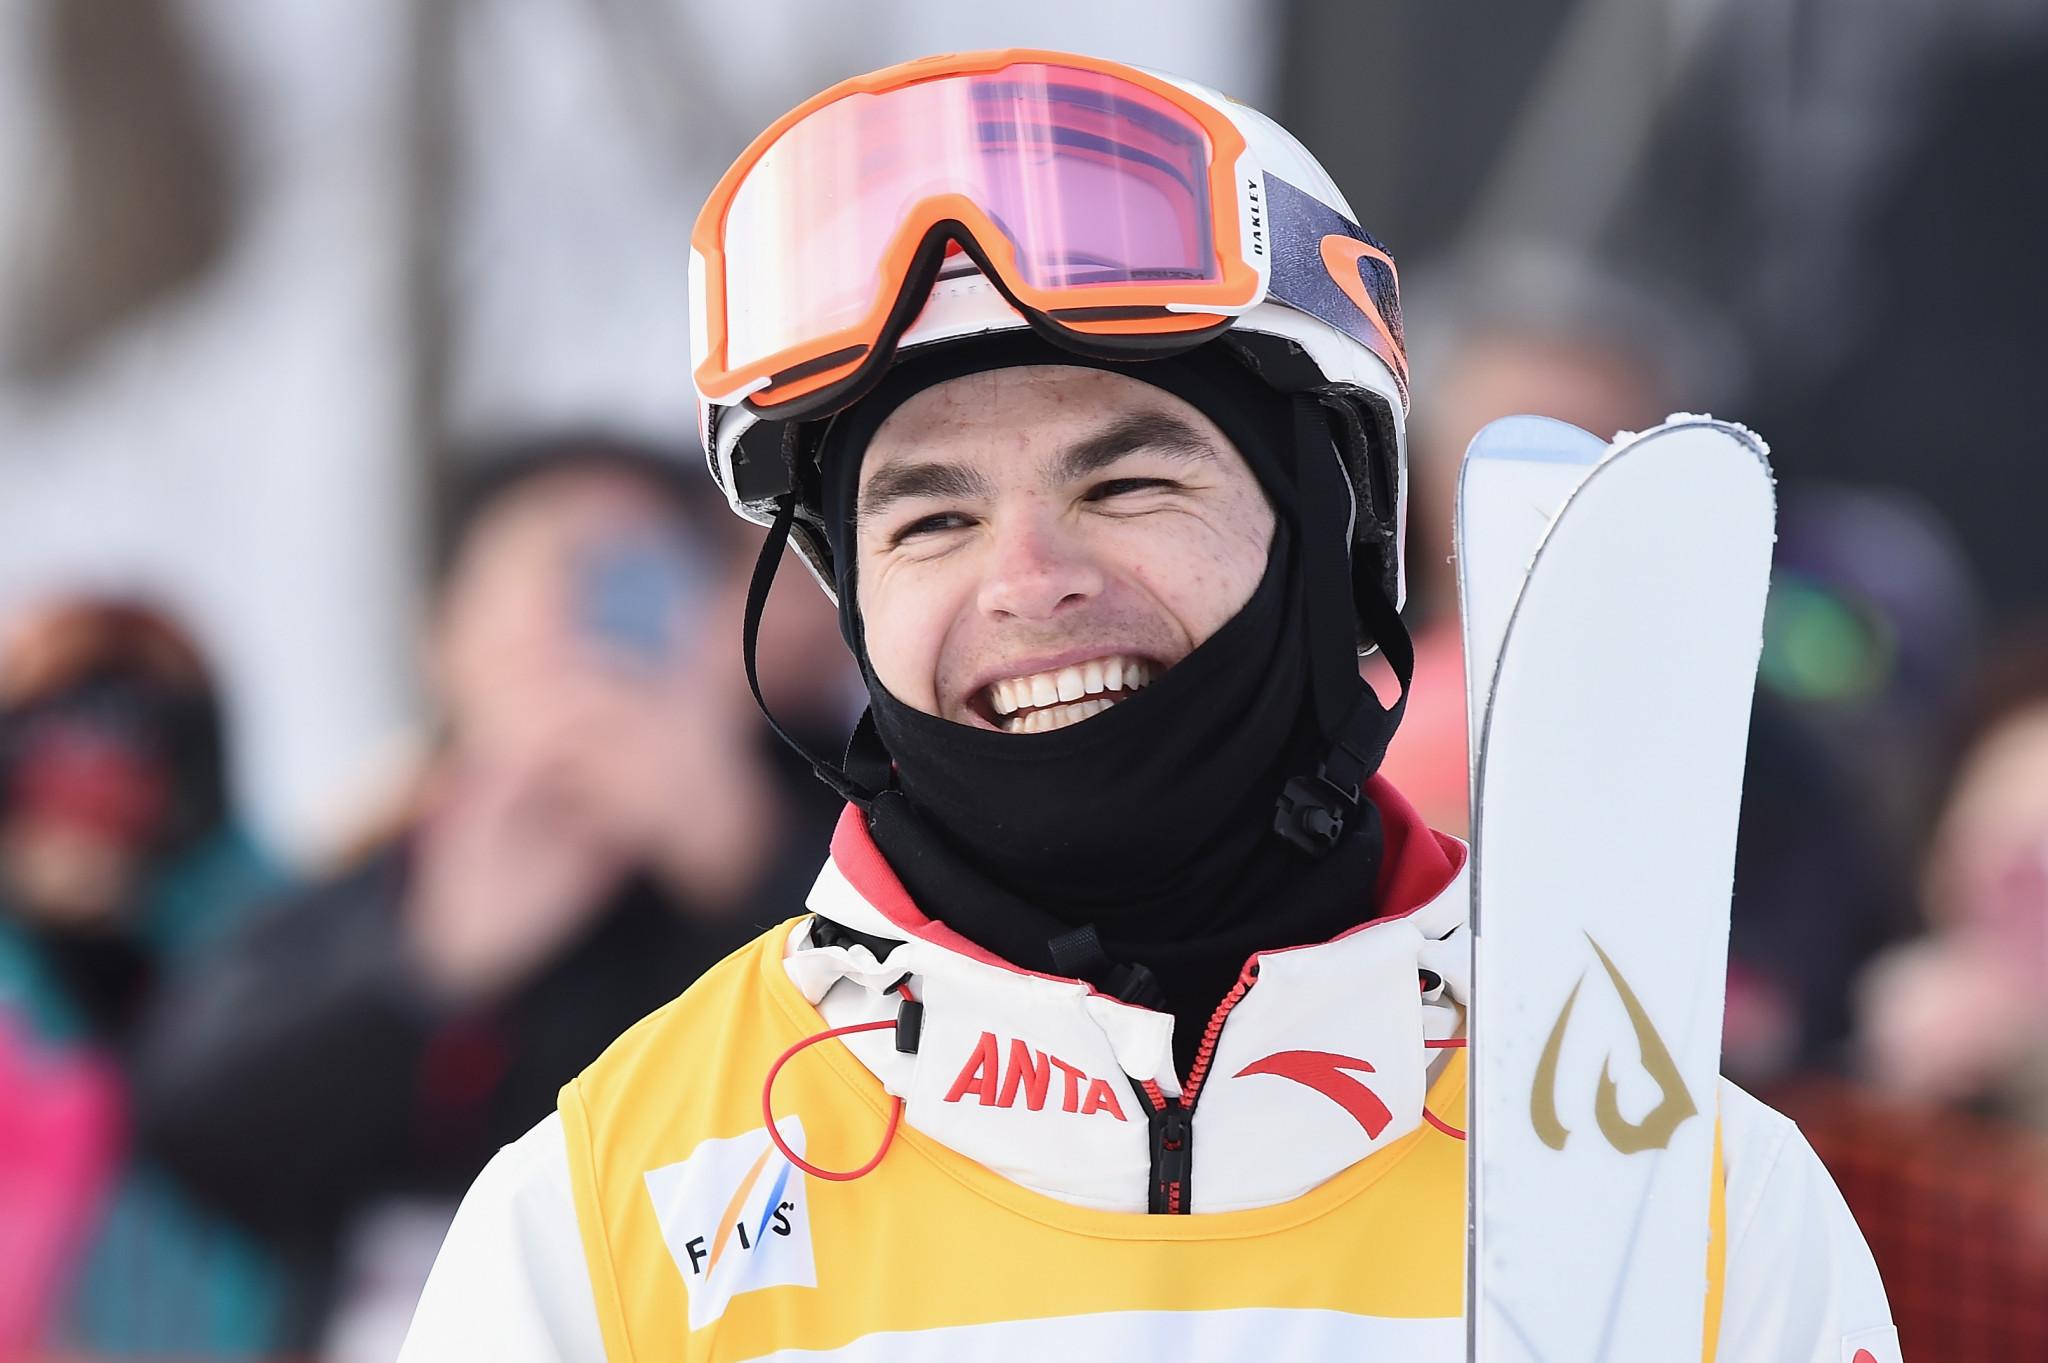 Kingsbury to make 100th FIS Freestyle Ski World Cup start, as moguls season begins in Ruka